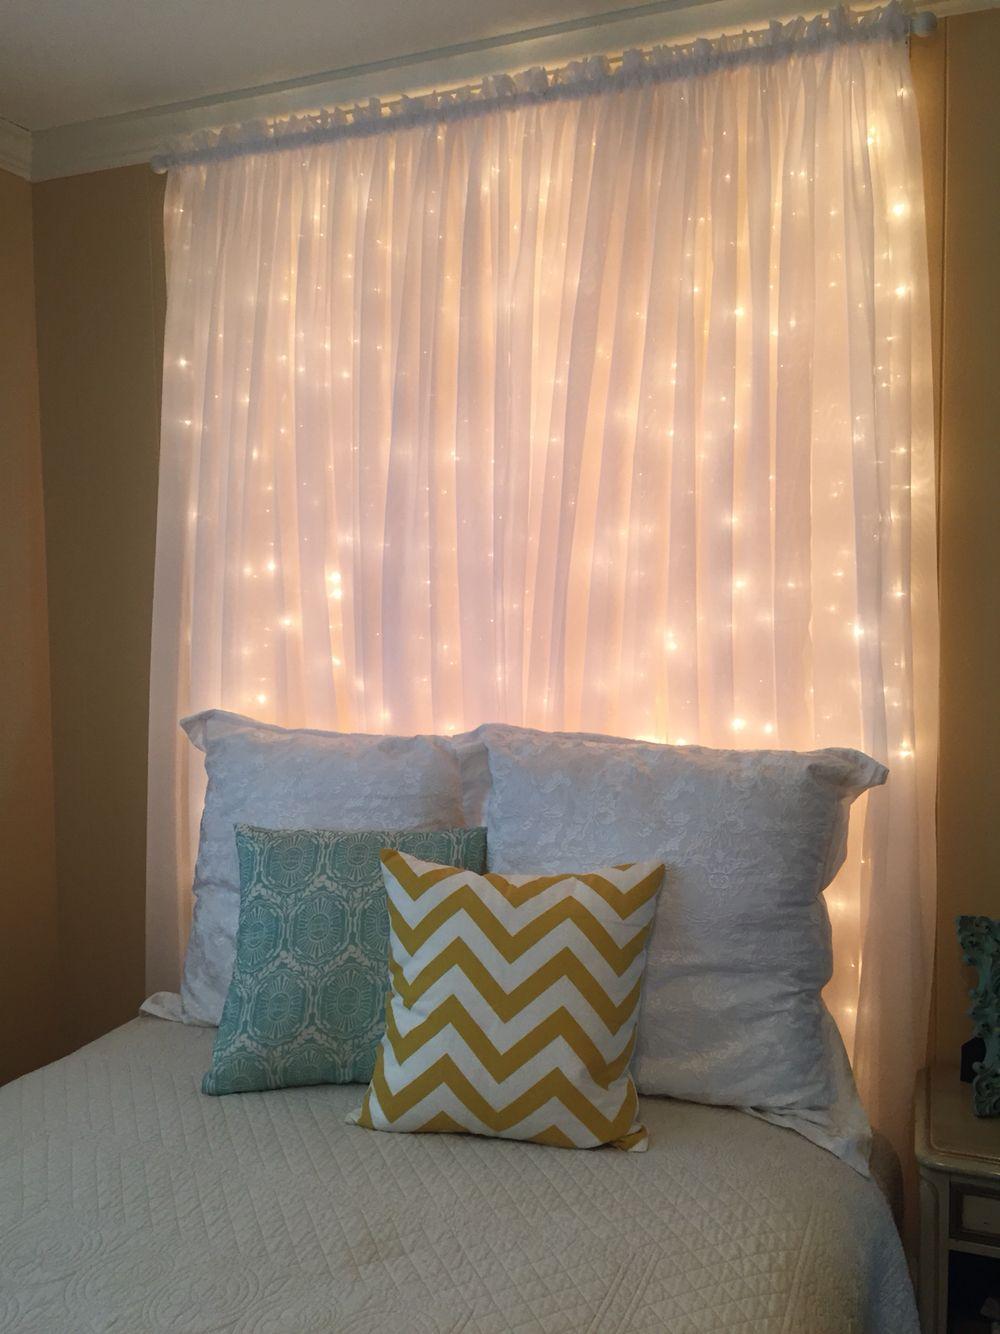 Dim Light Up Headboard Diy Bedroom Diy Bedroom Decor Apartment